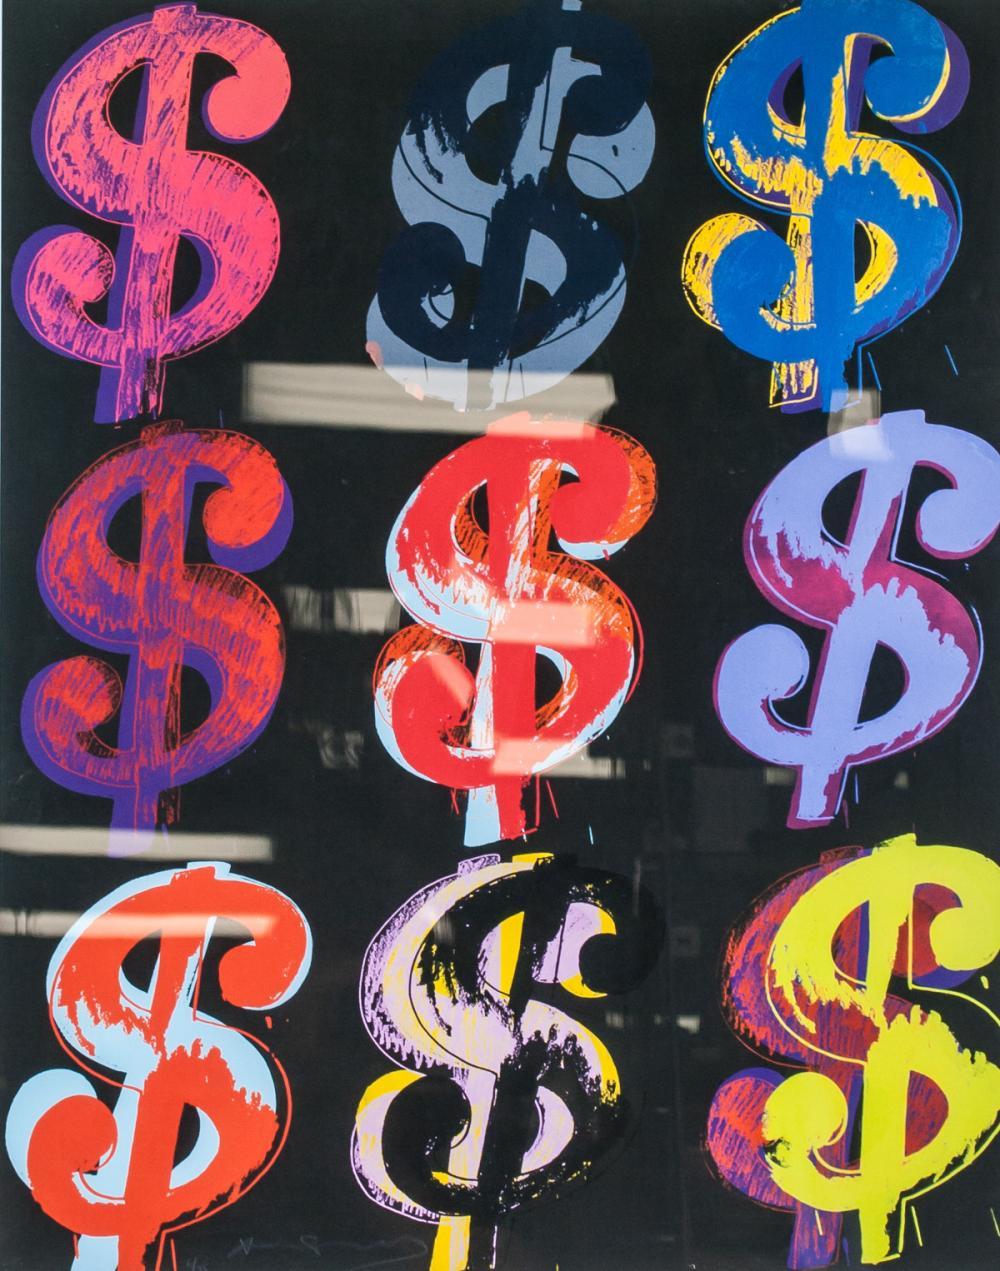 Lot 51: Andy Warhol US Pop Signed Litho $9 on Black 6/25